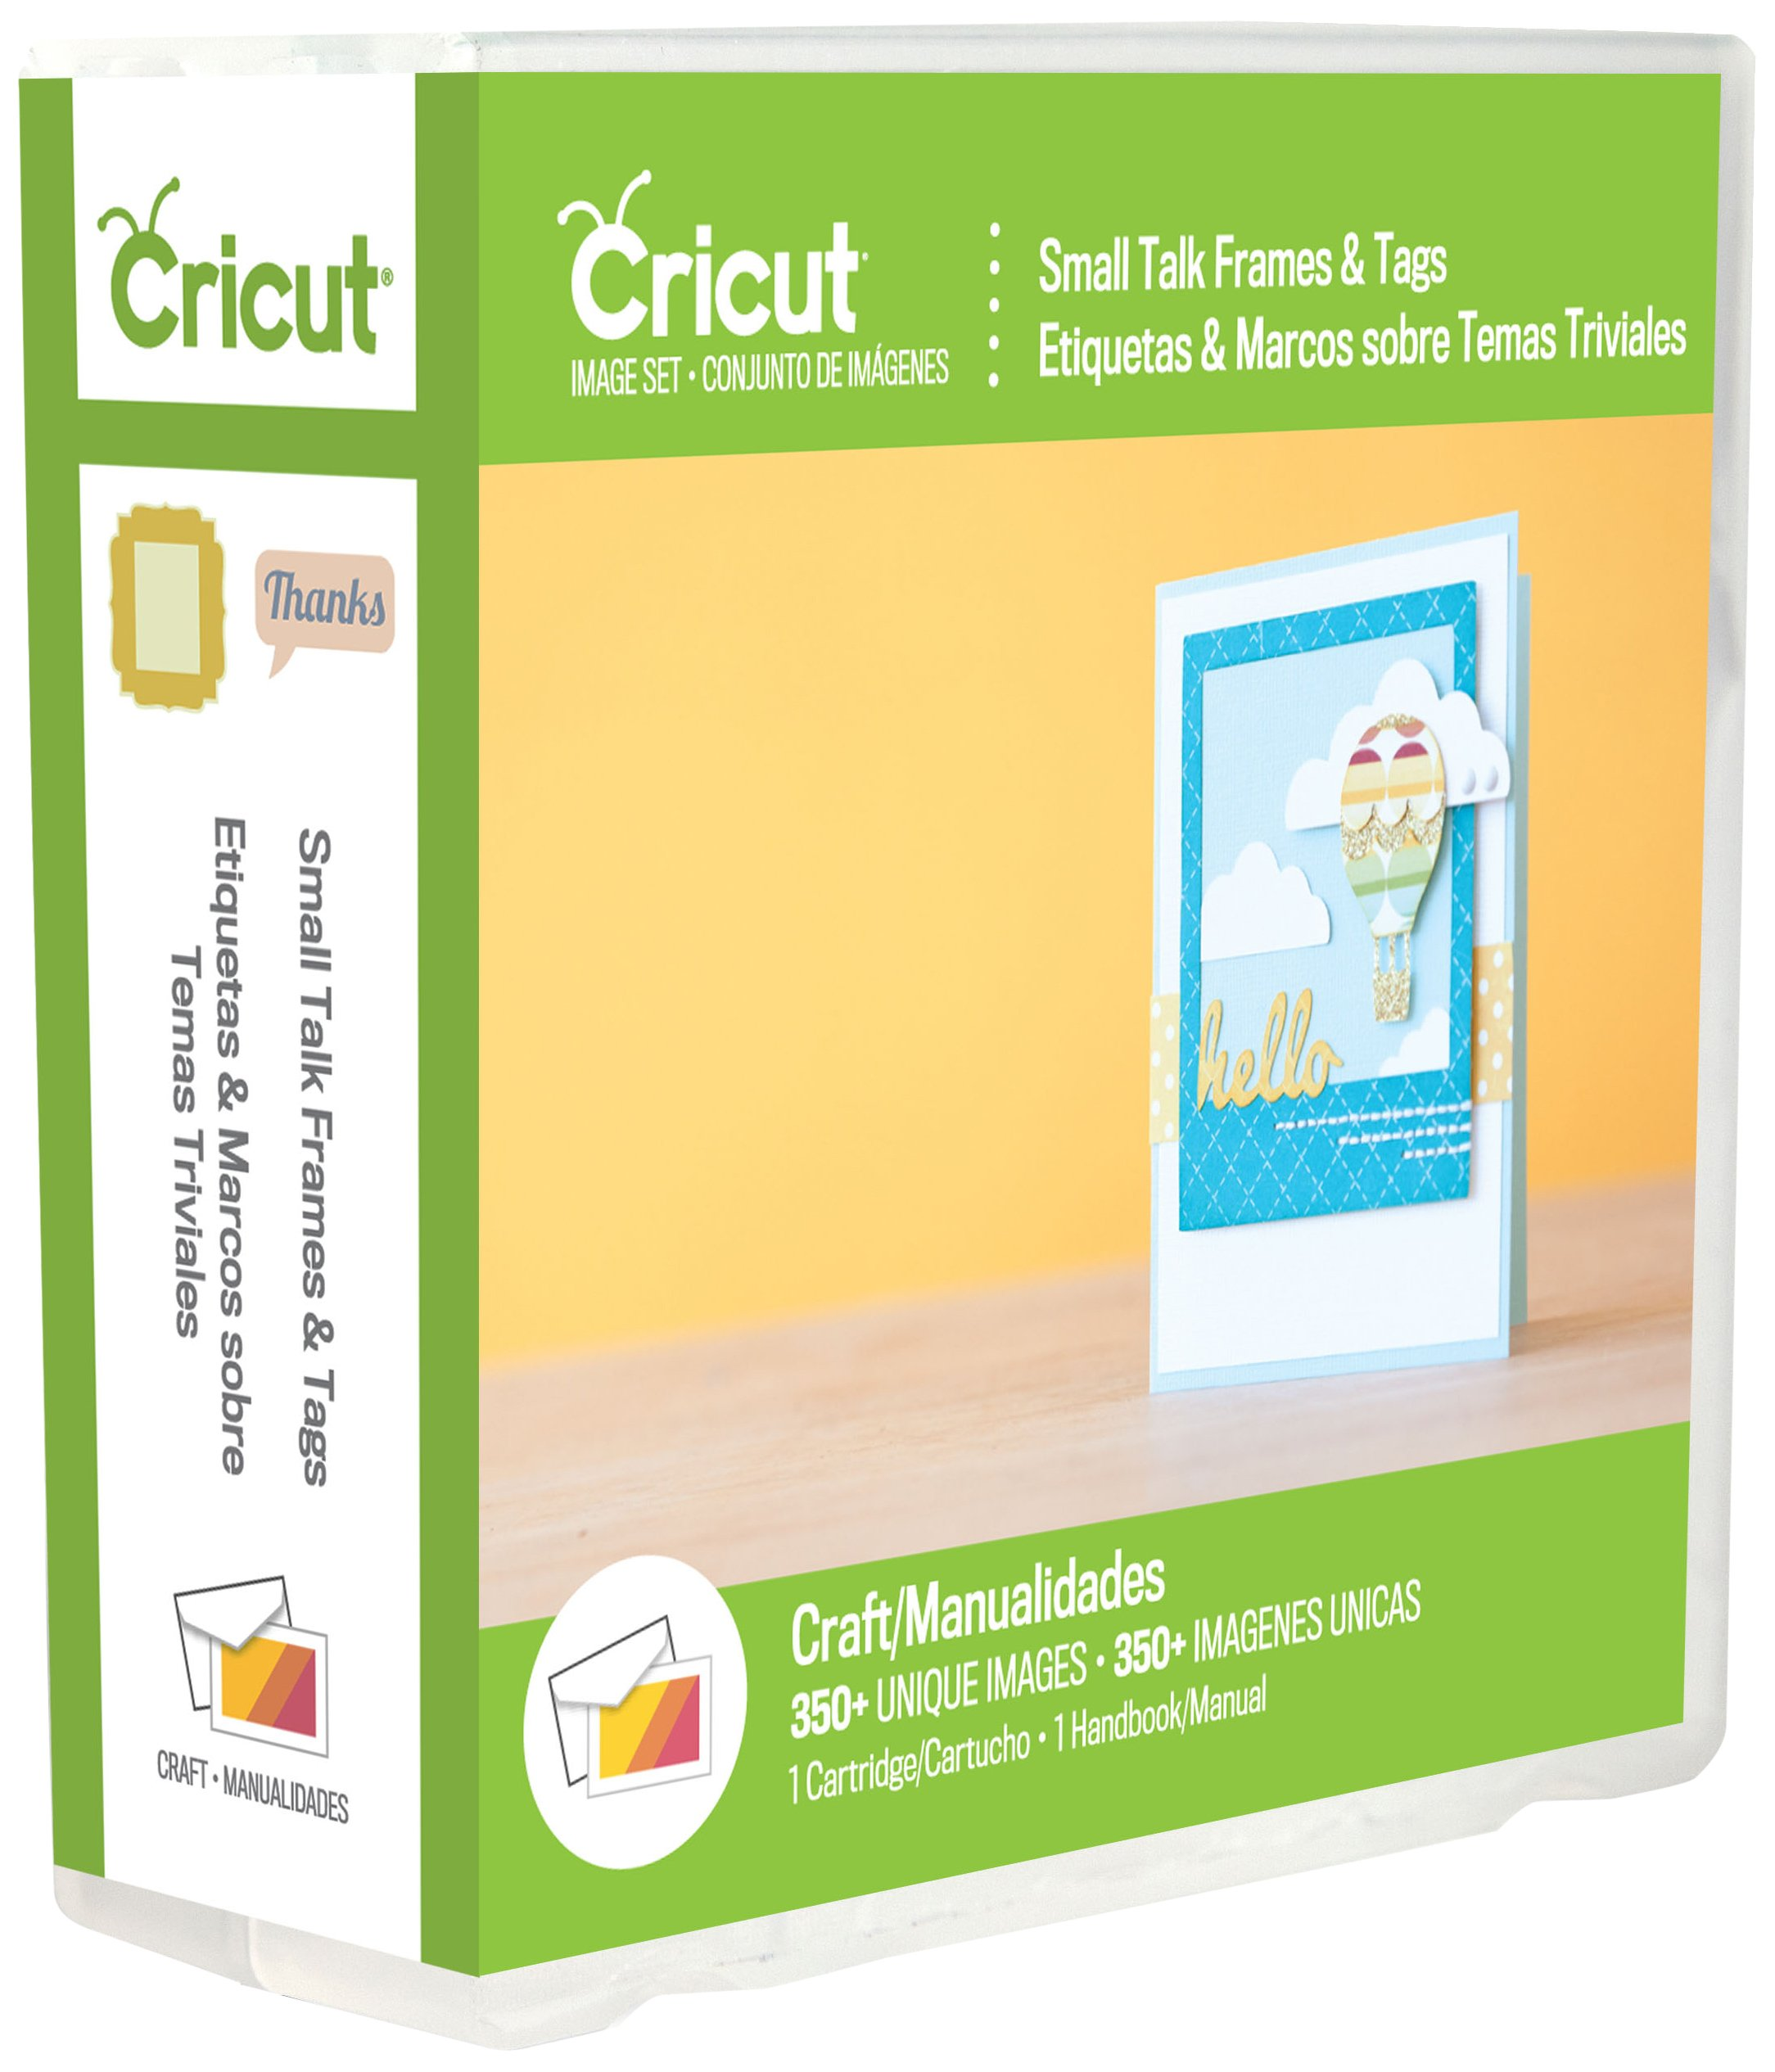 Cricut 2002240 Talk Frames and Tags Cartridge for Artwork, Small